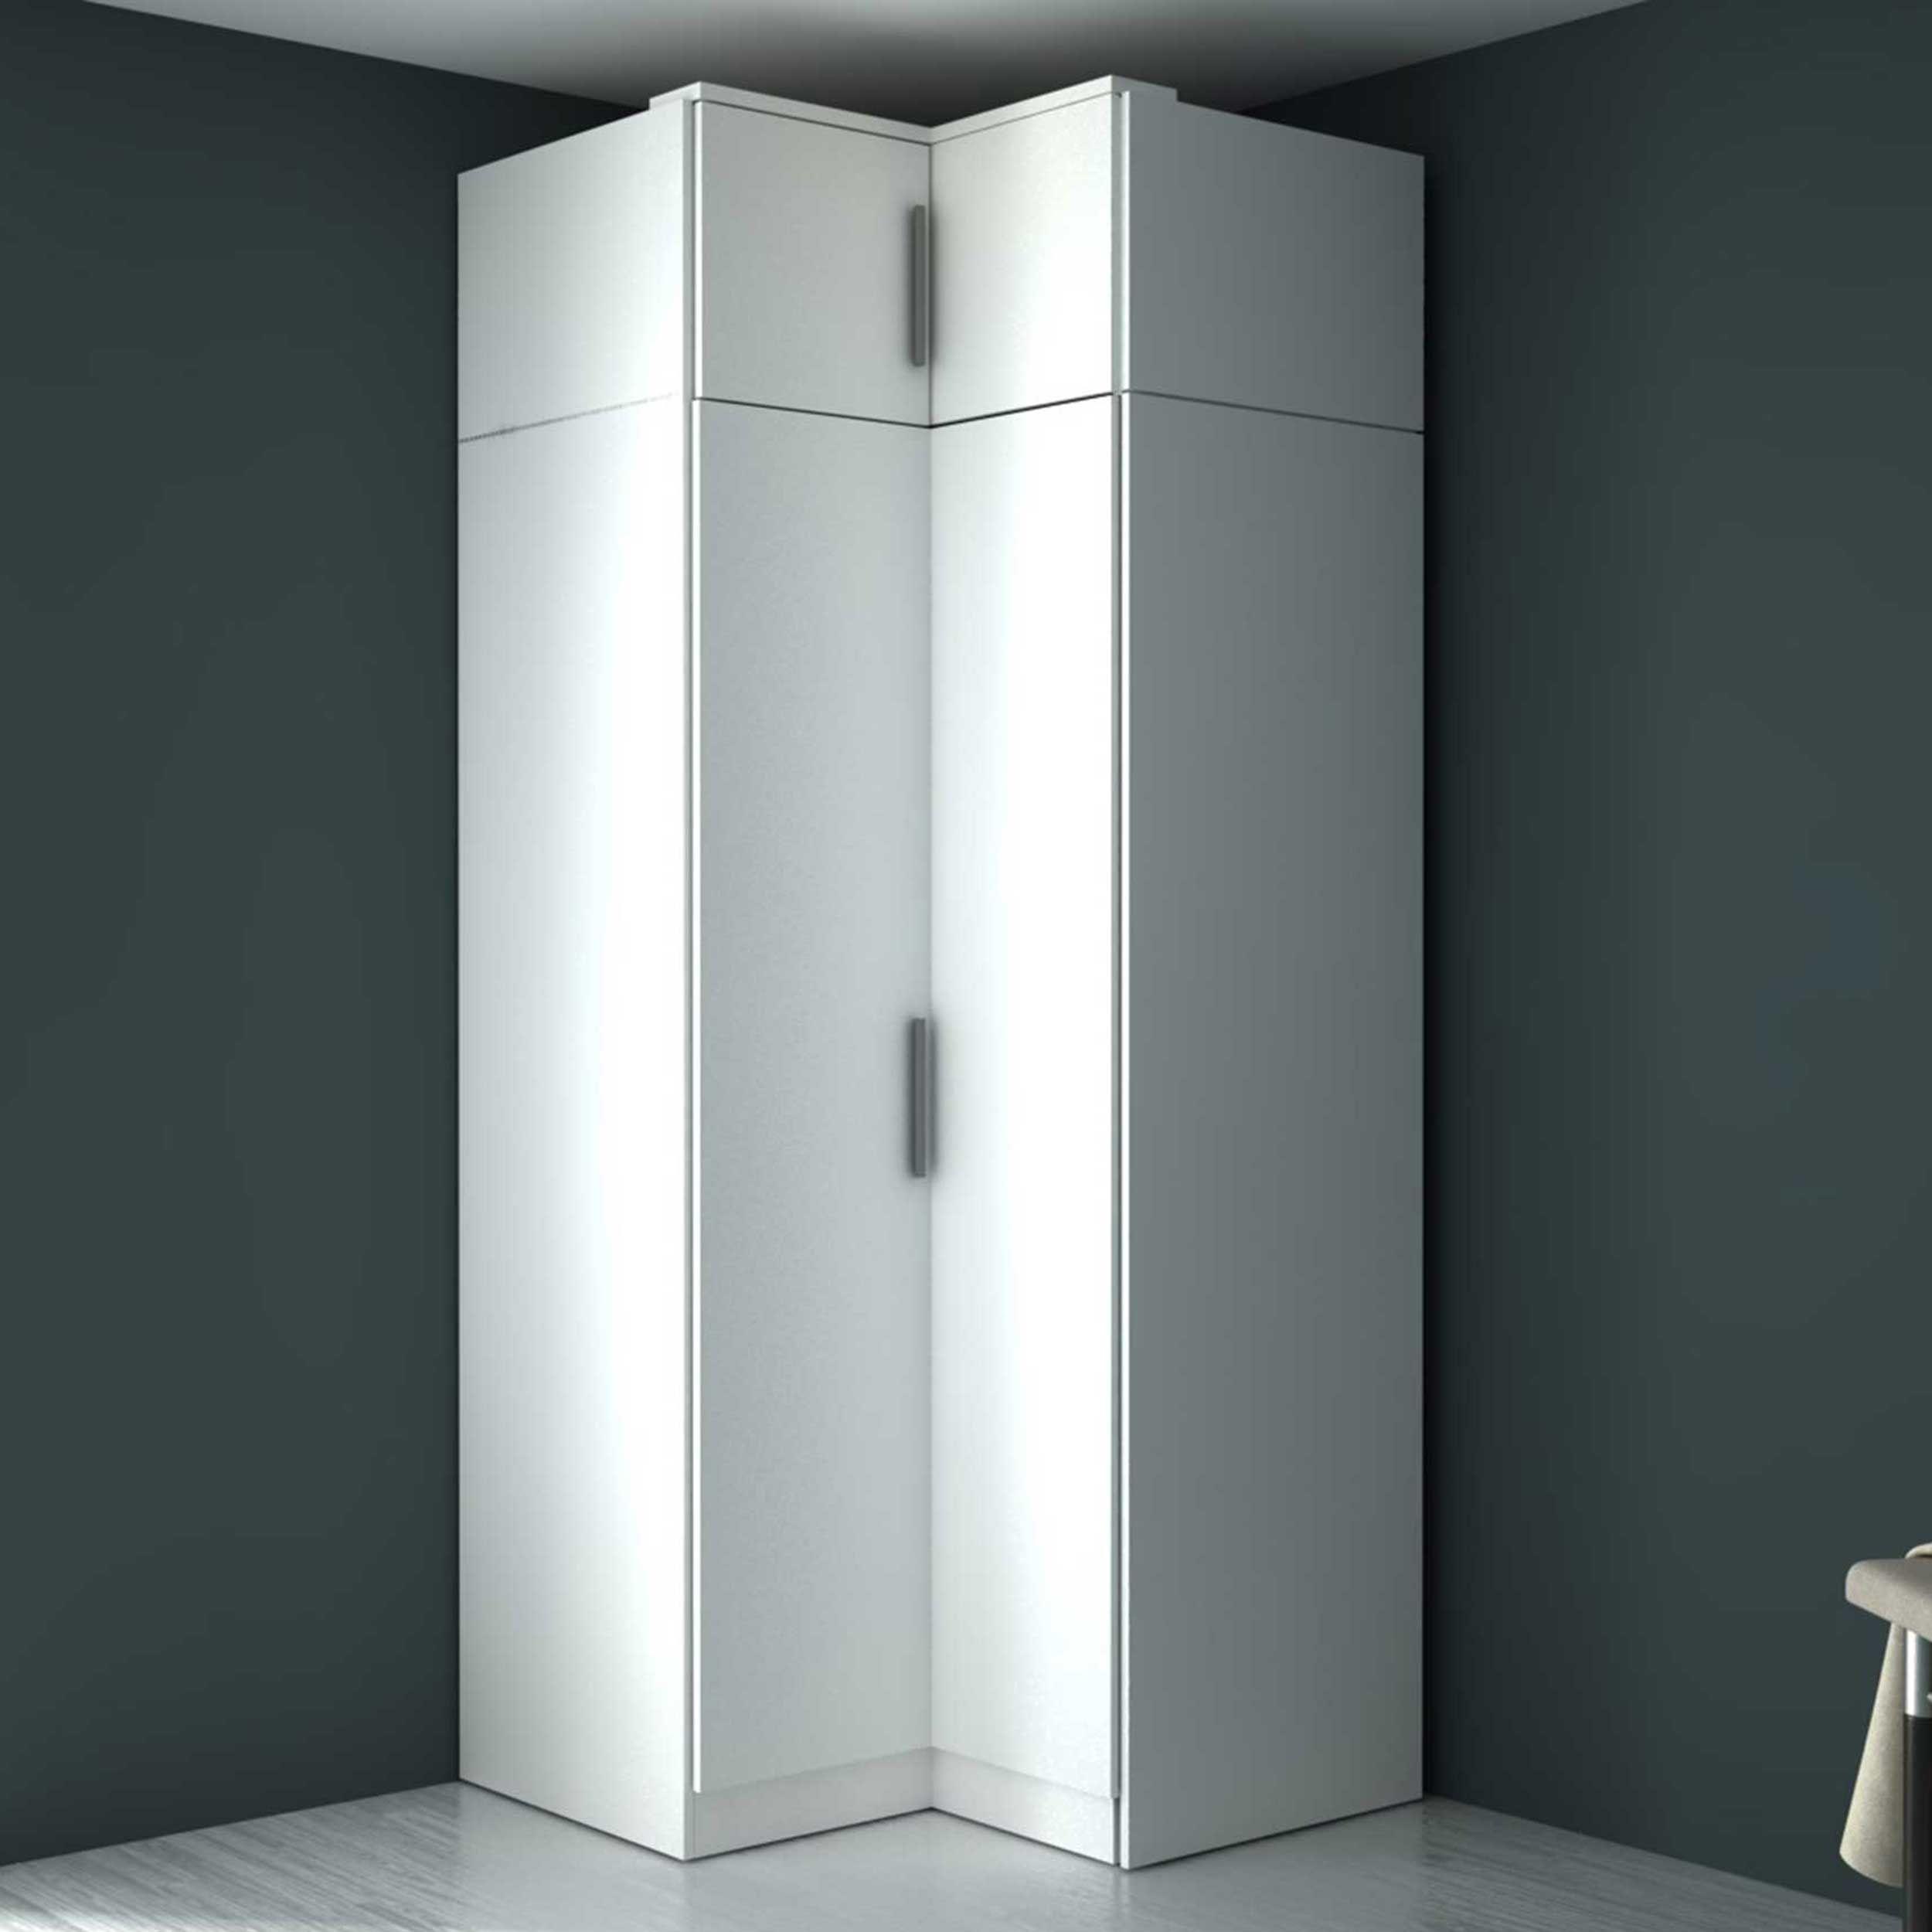 armoire d angle ramos 90cm avec 2 portes blanc